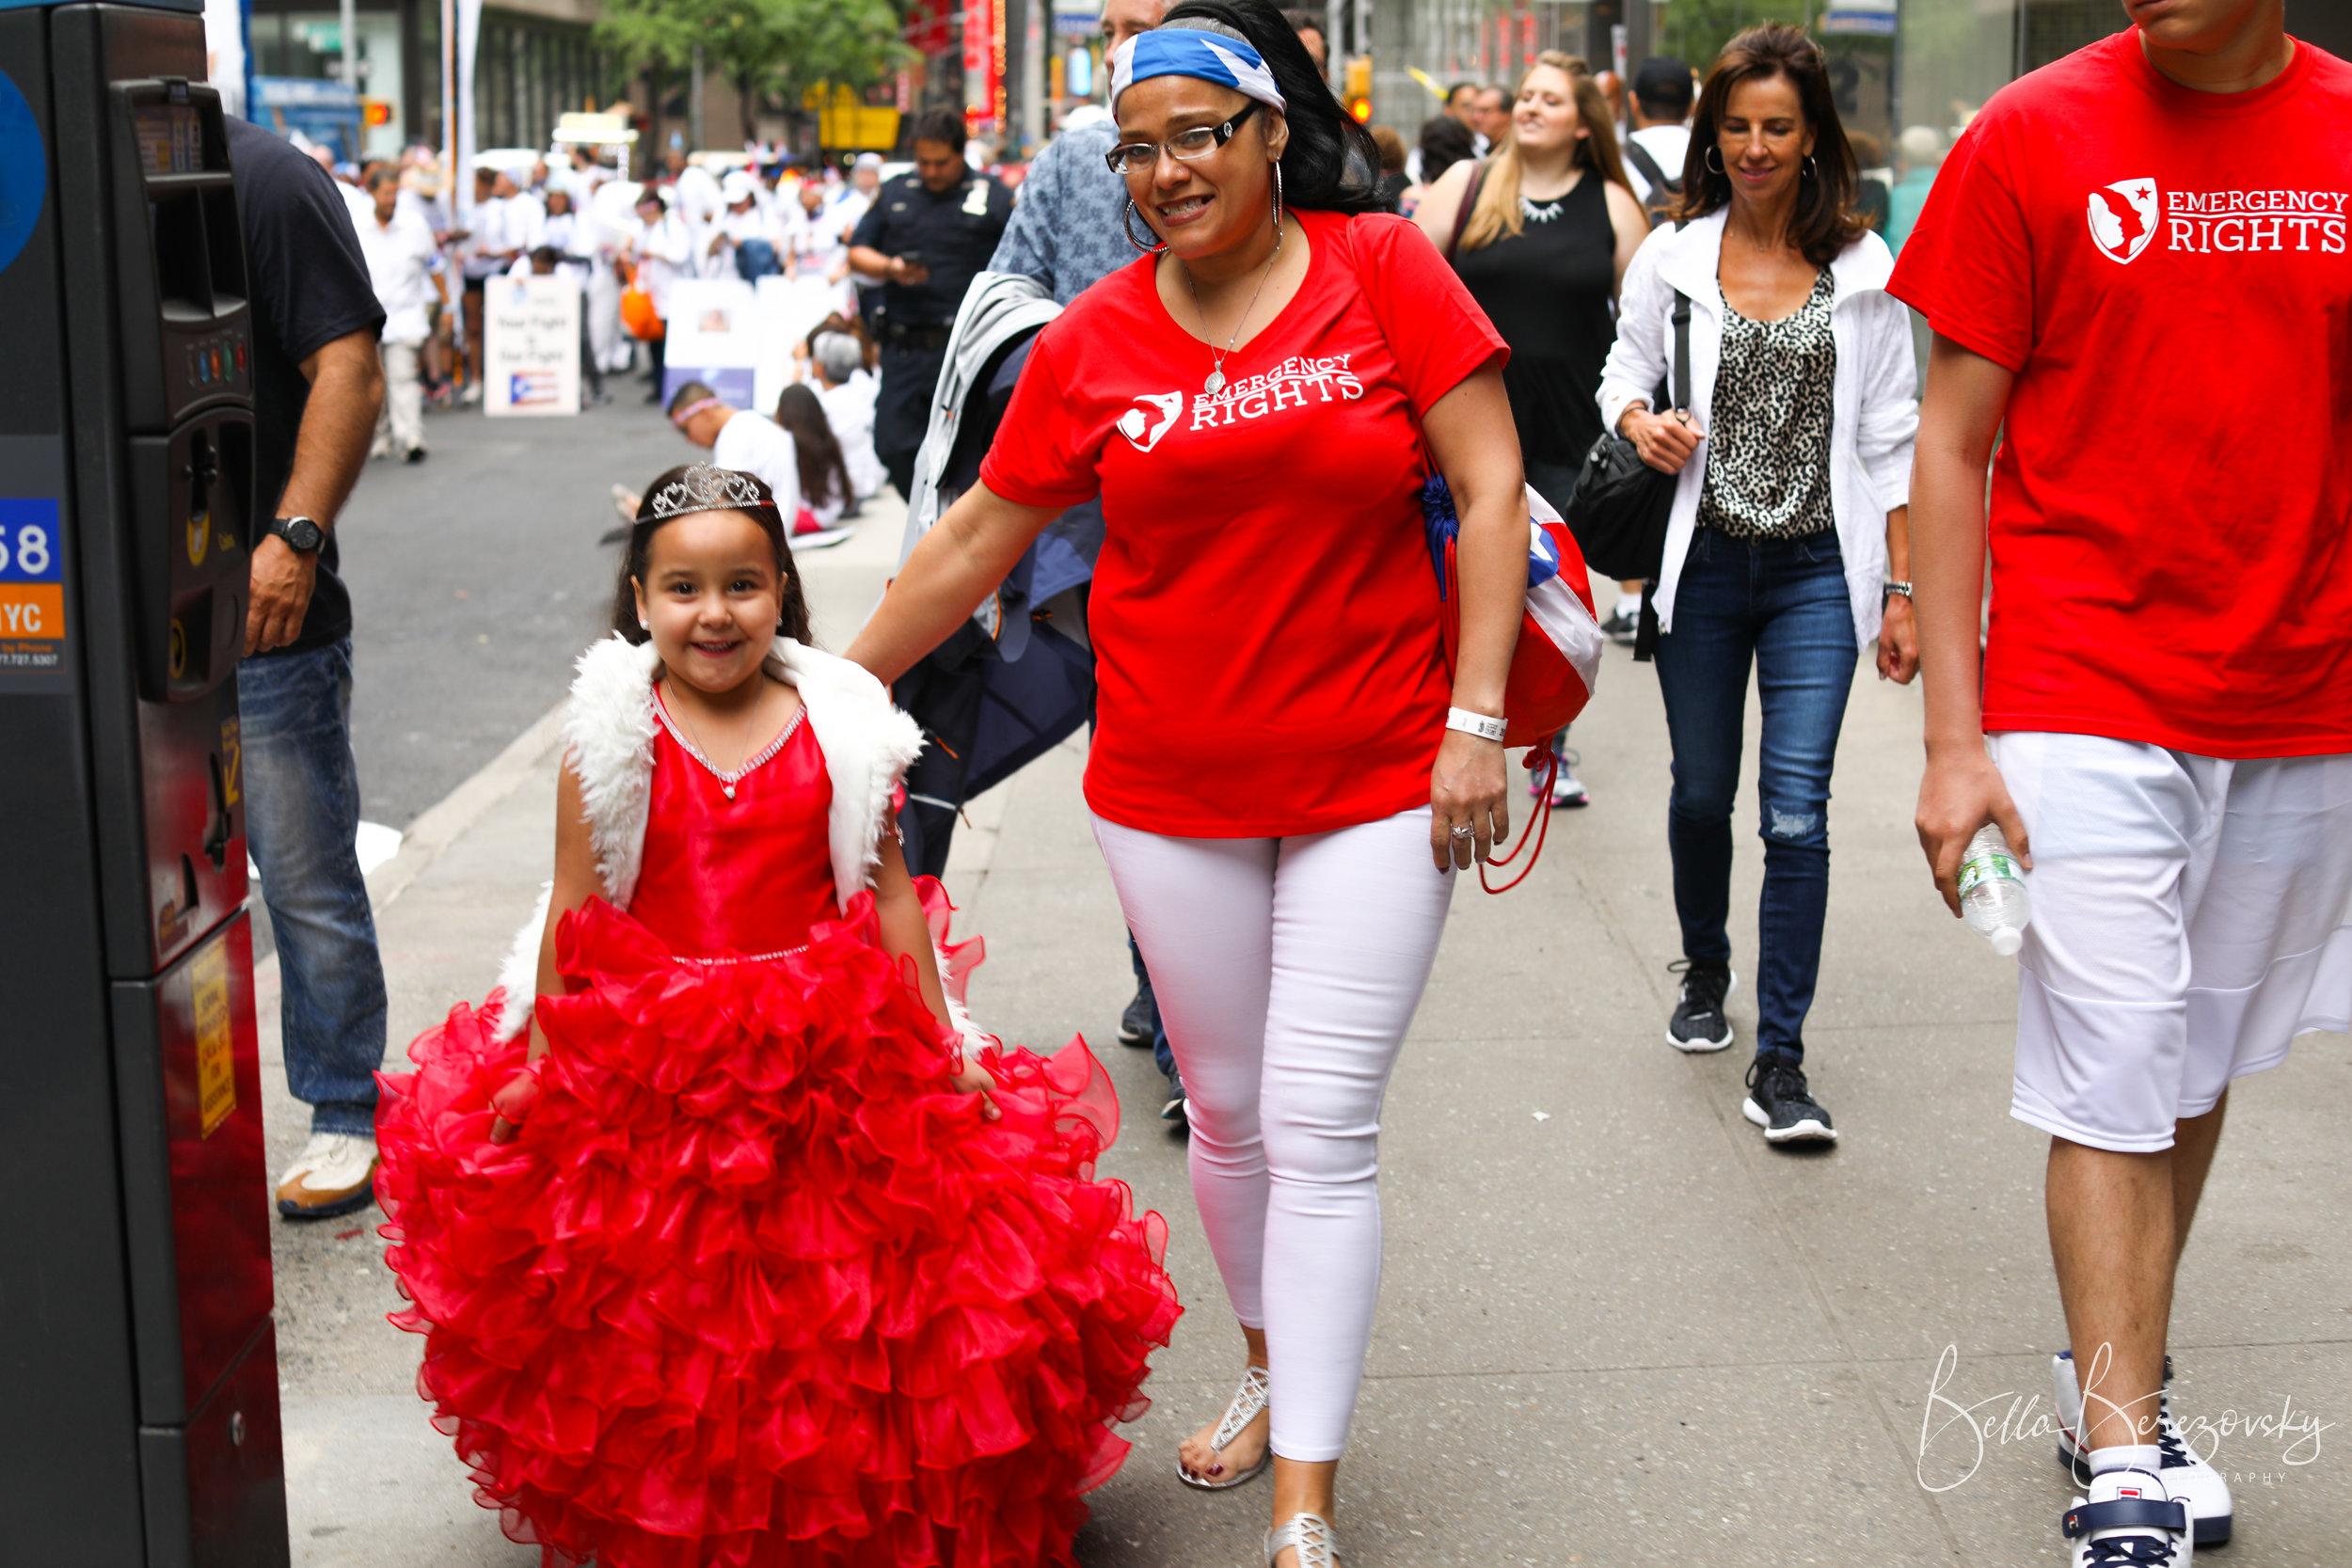 Puerto Rican Day Parade 2018